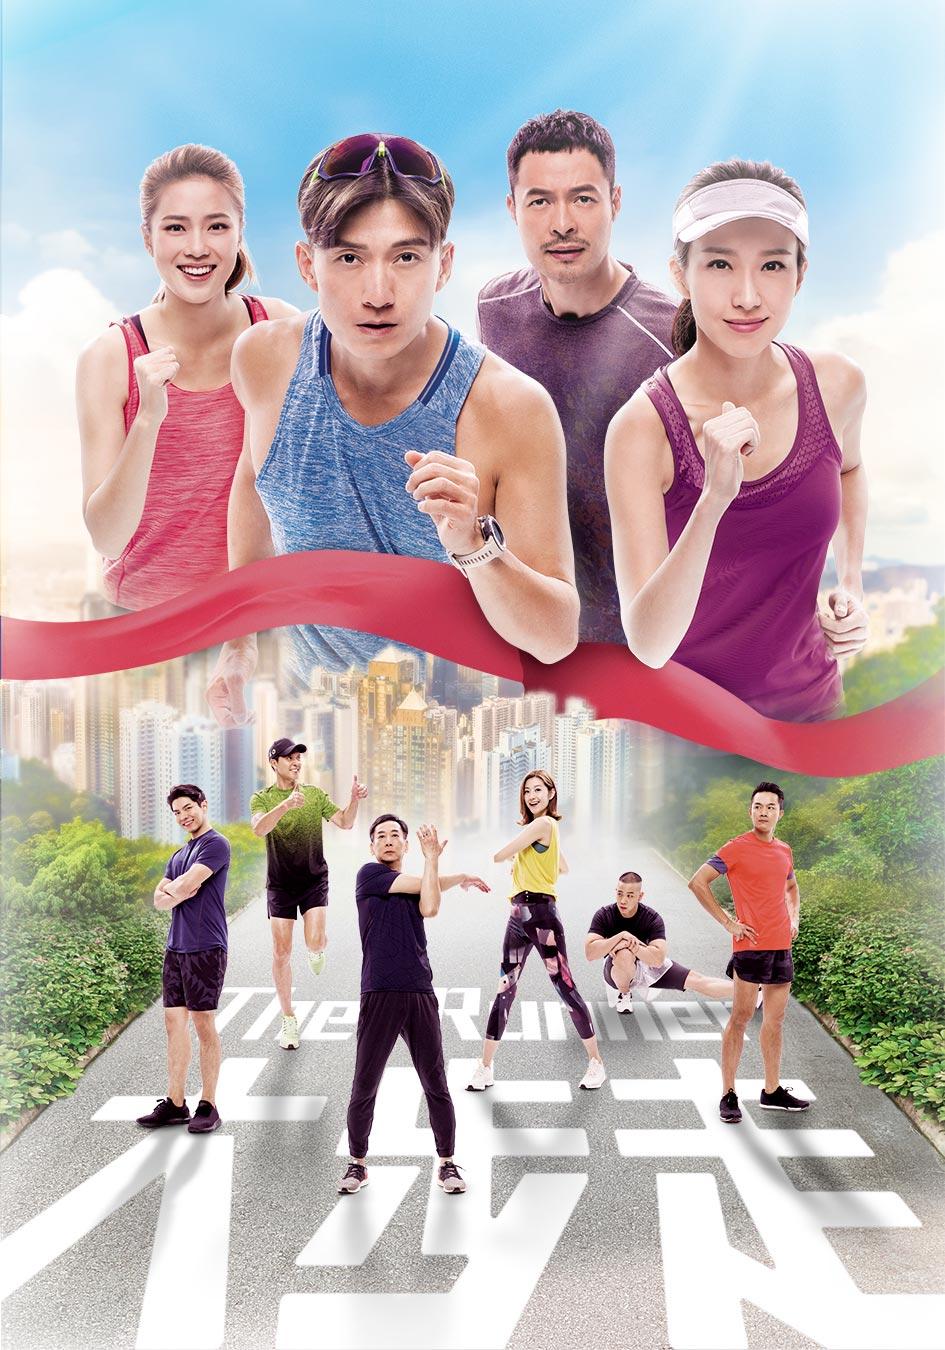 大步走-The Runner